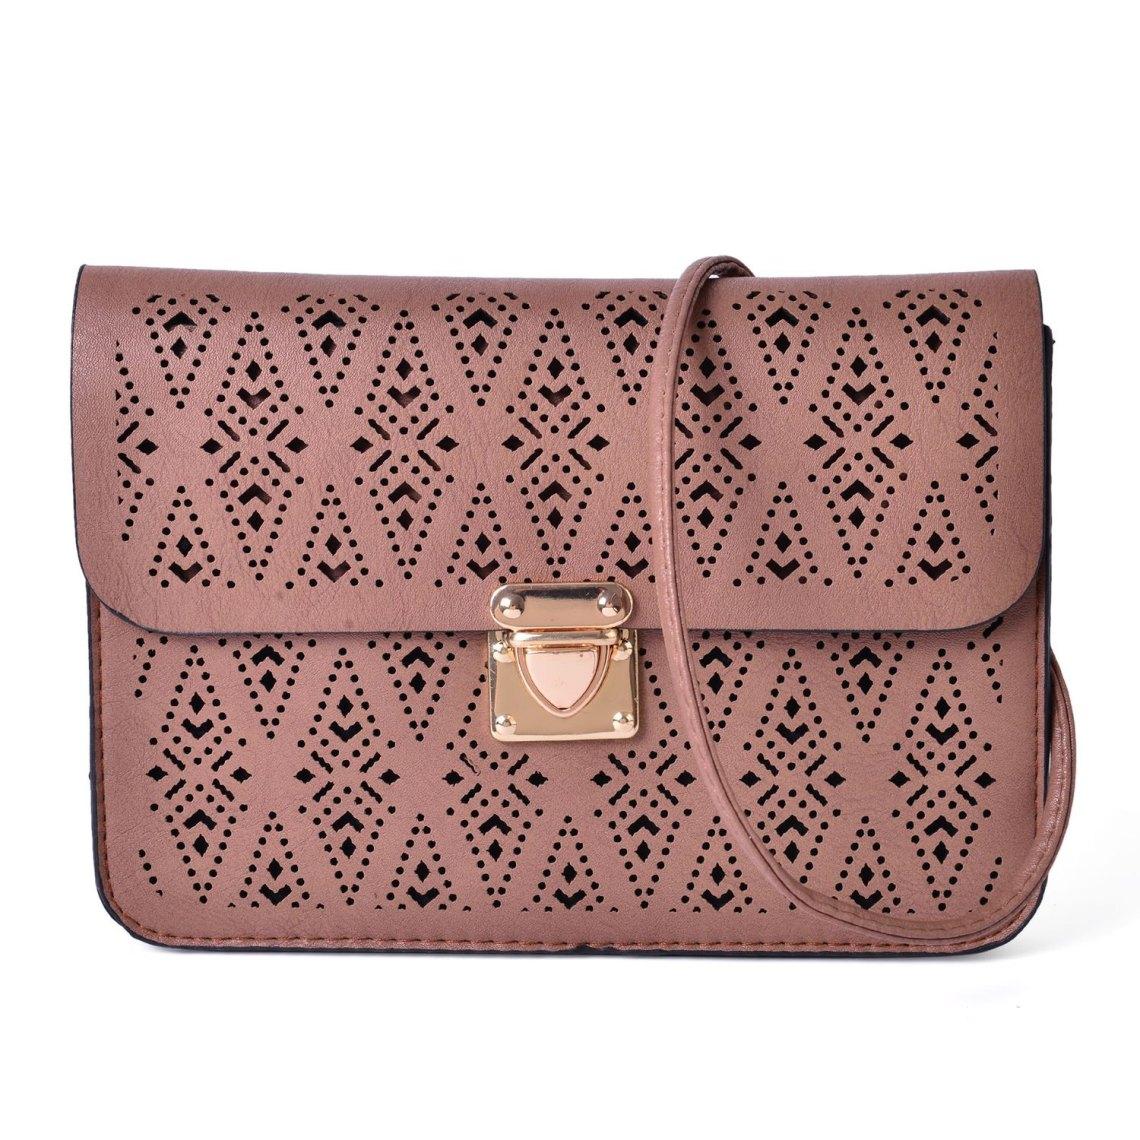 J Francis - Camel Faux Leather Crossbody Bag